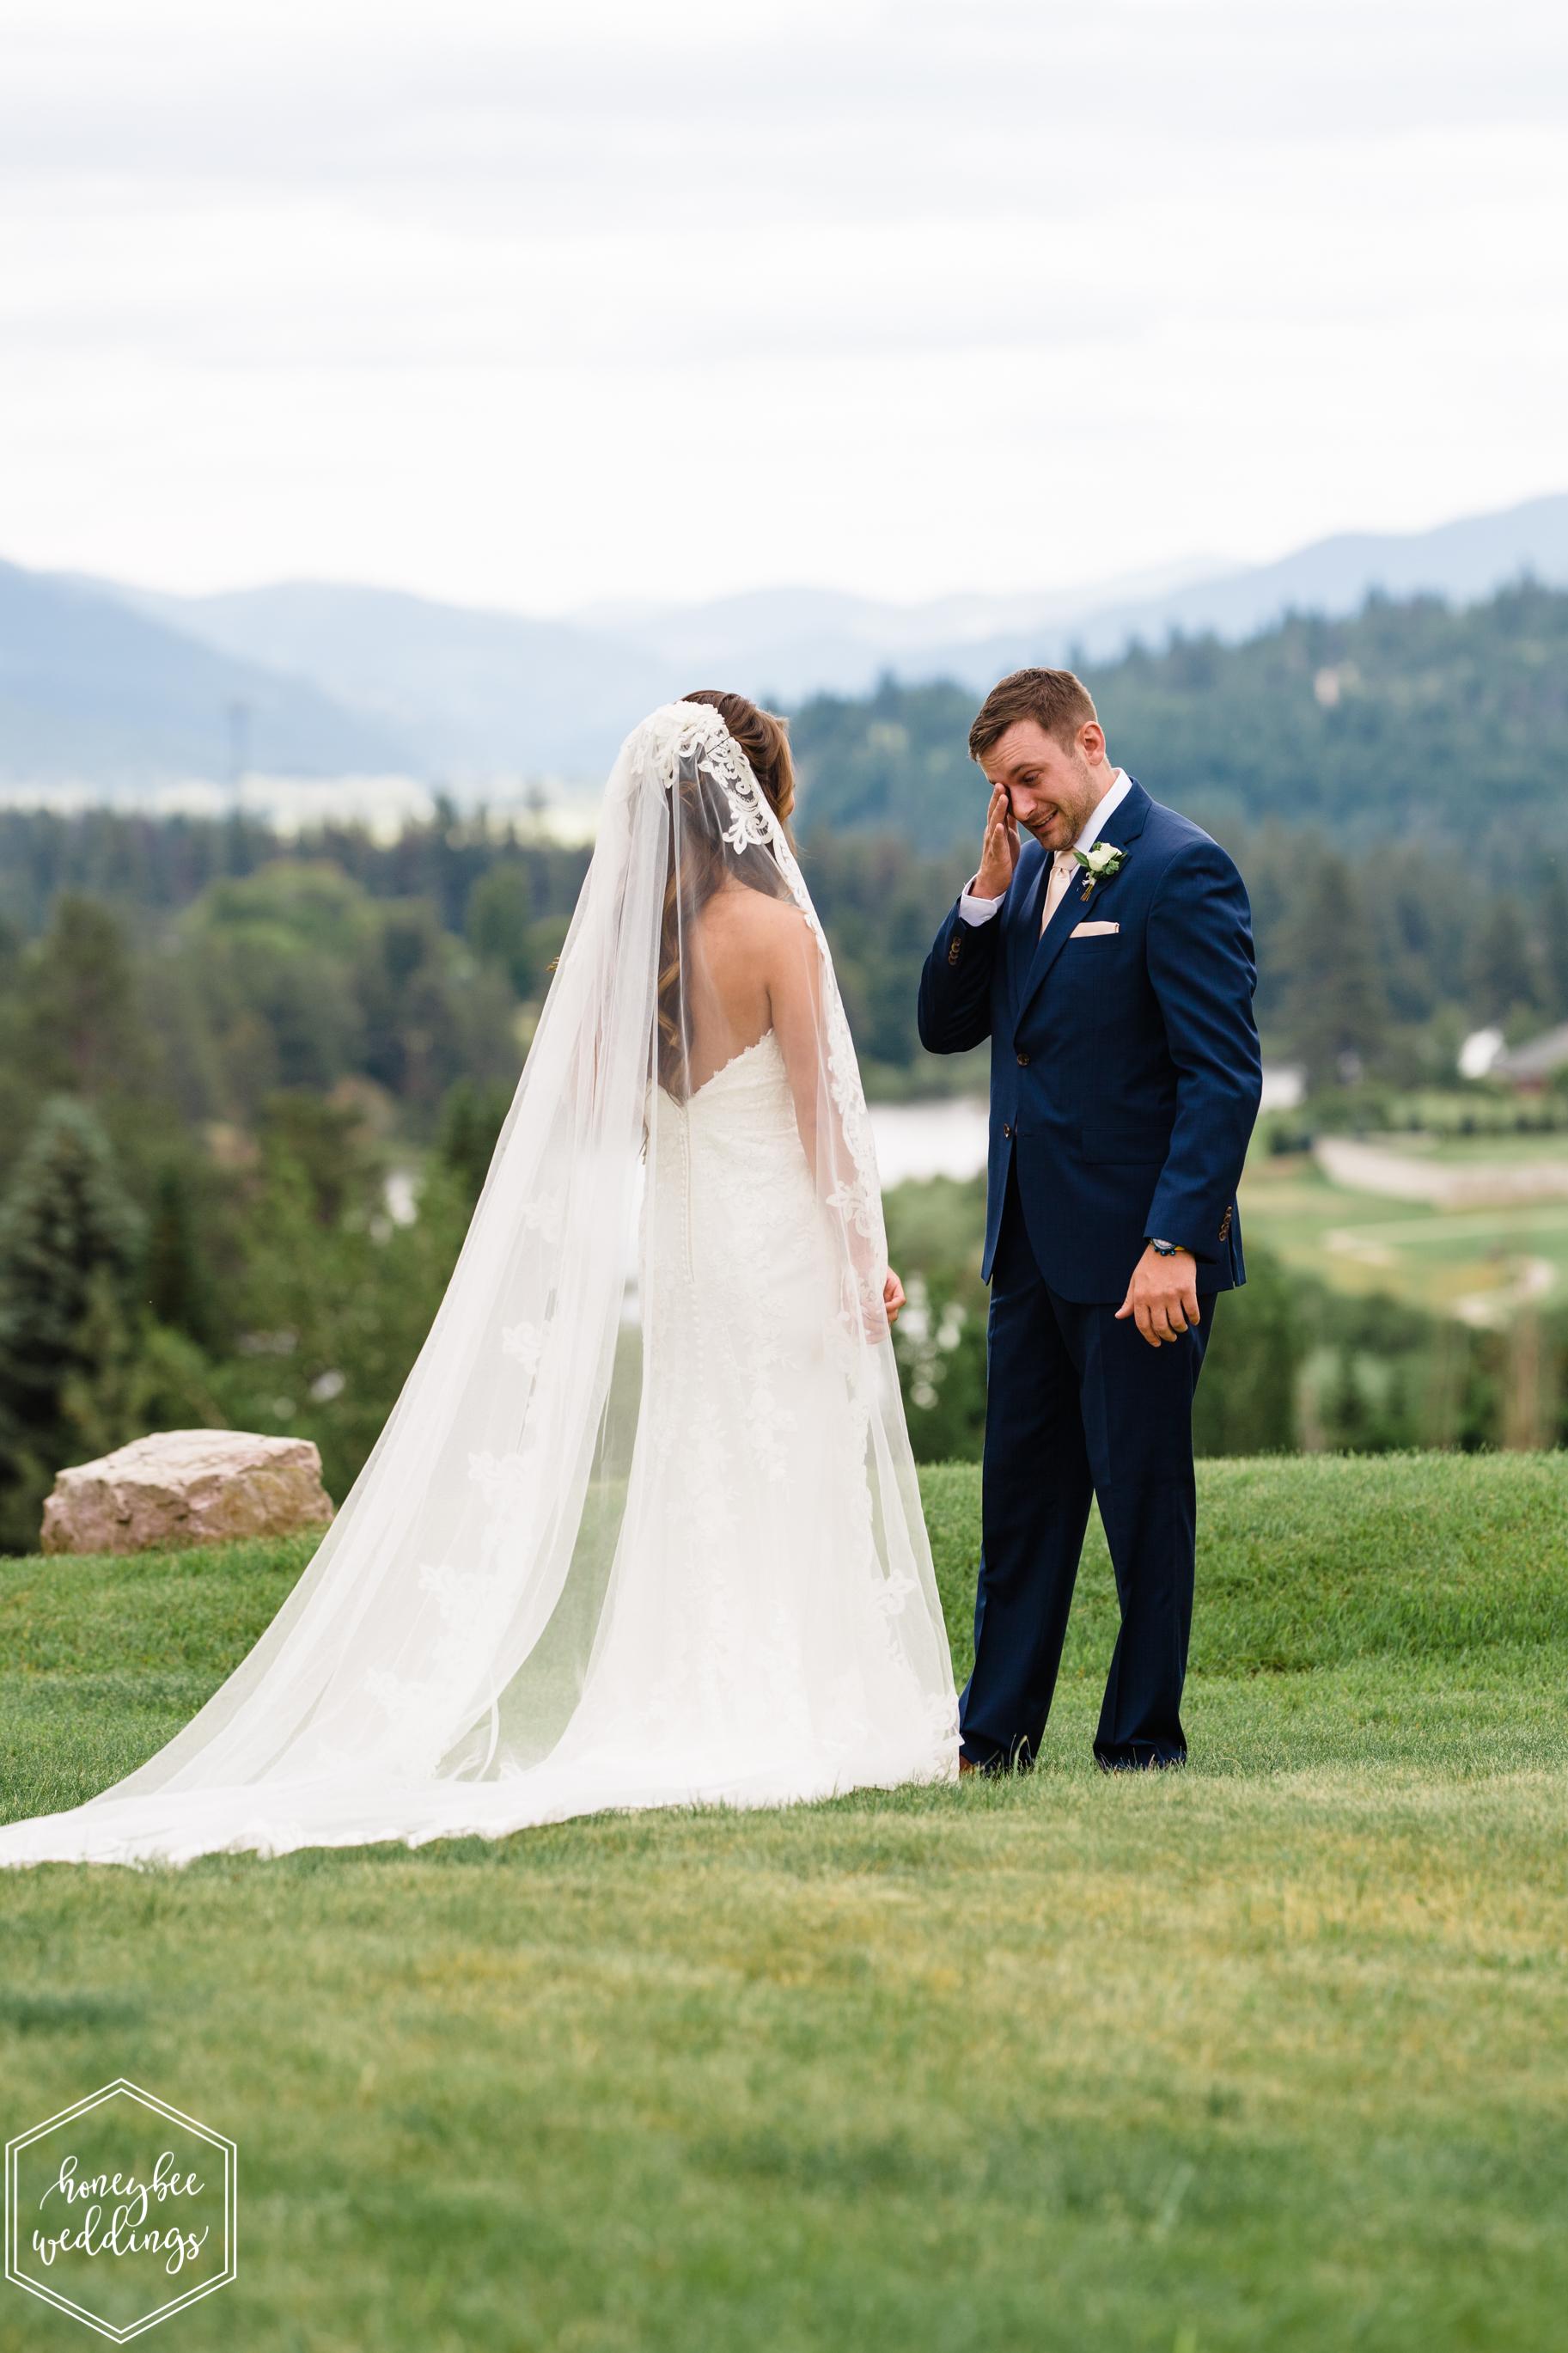 013Montana Wedding Photographer_Missoula Wedding_Honeybee Weddings_Devlin & Jacob_June 22, 2019-1427.jpg